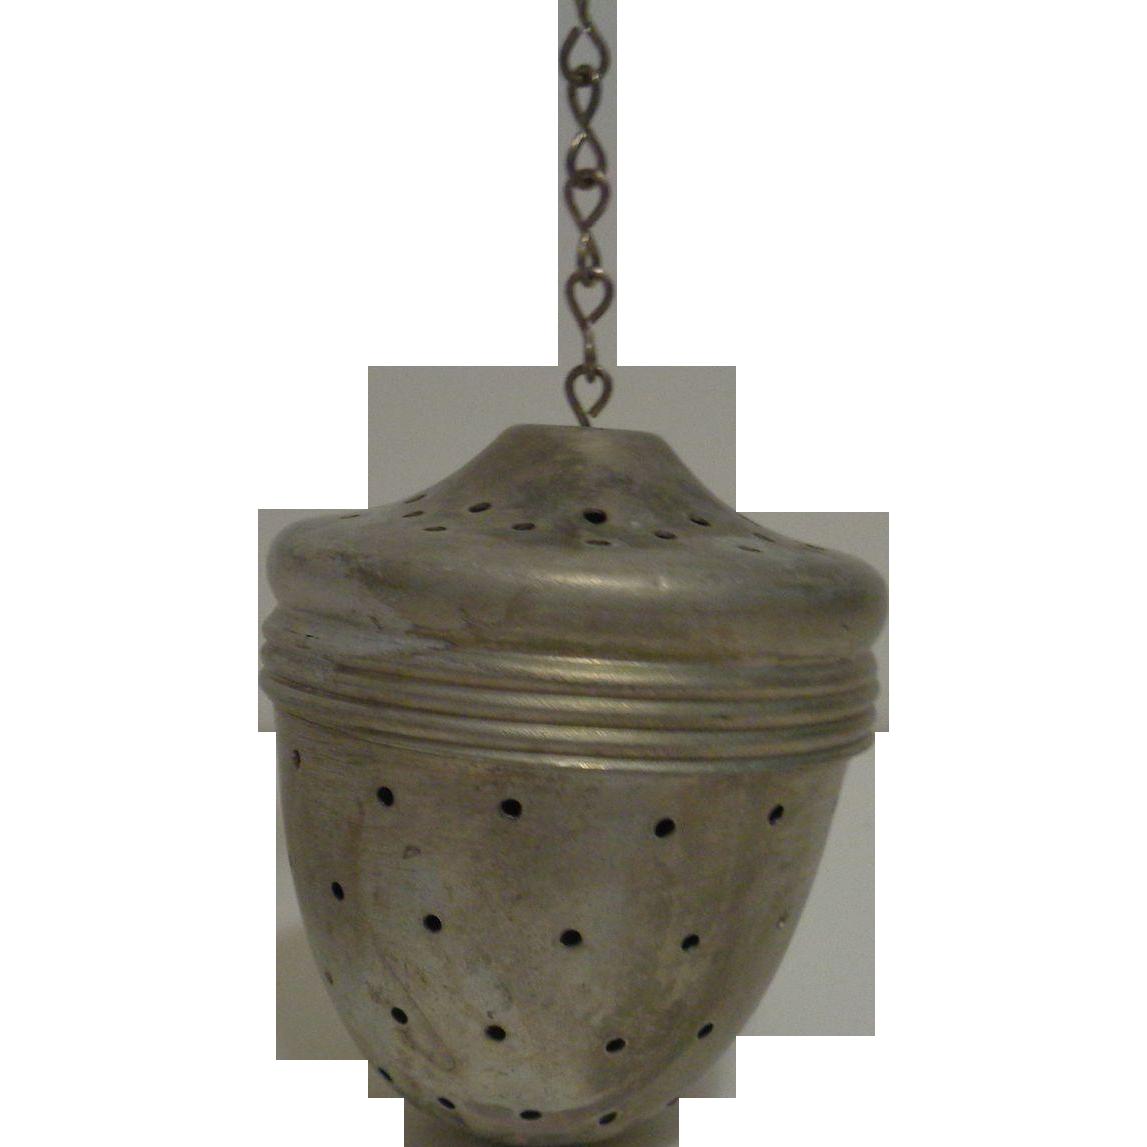 Aluminum Acorn Shaped Tea Ball Infuser